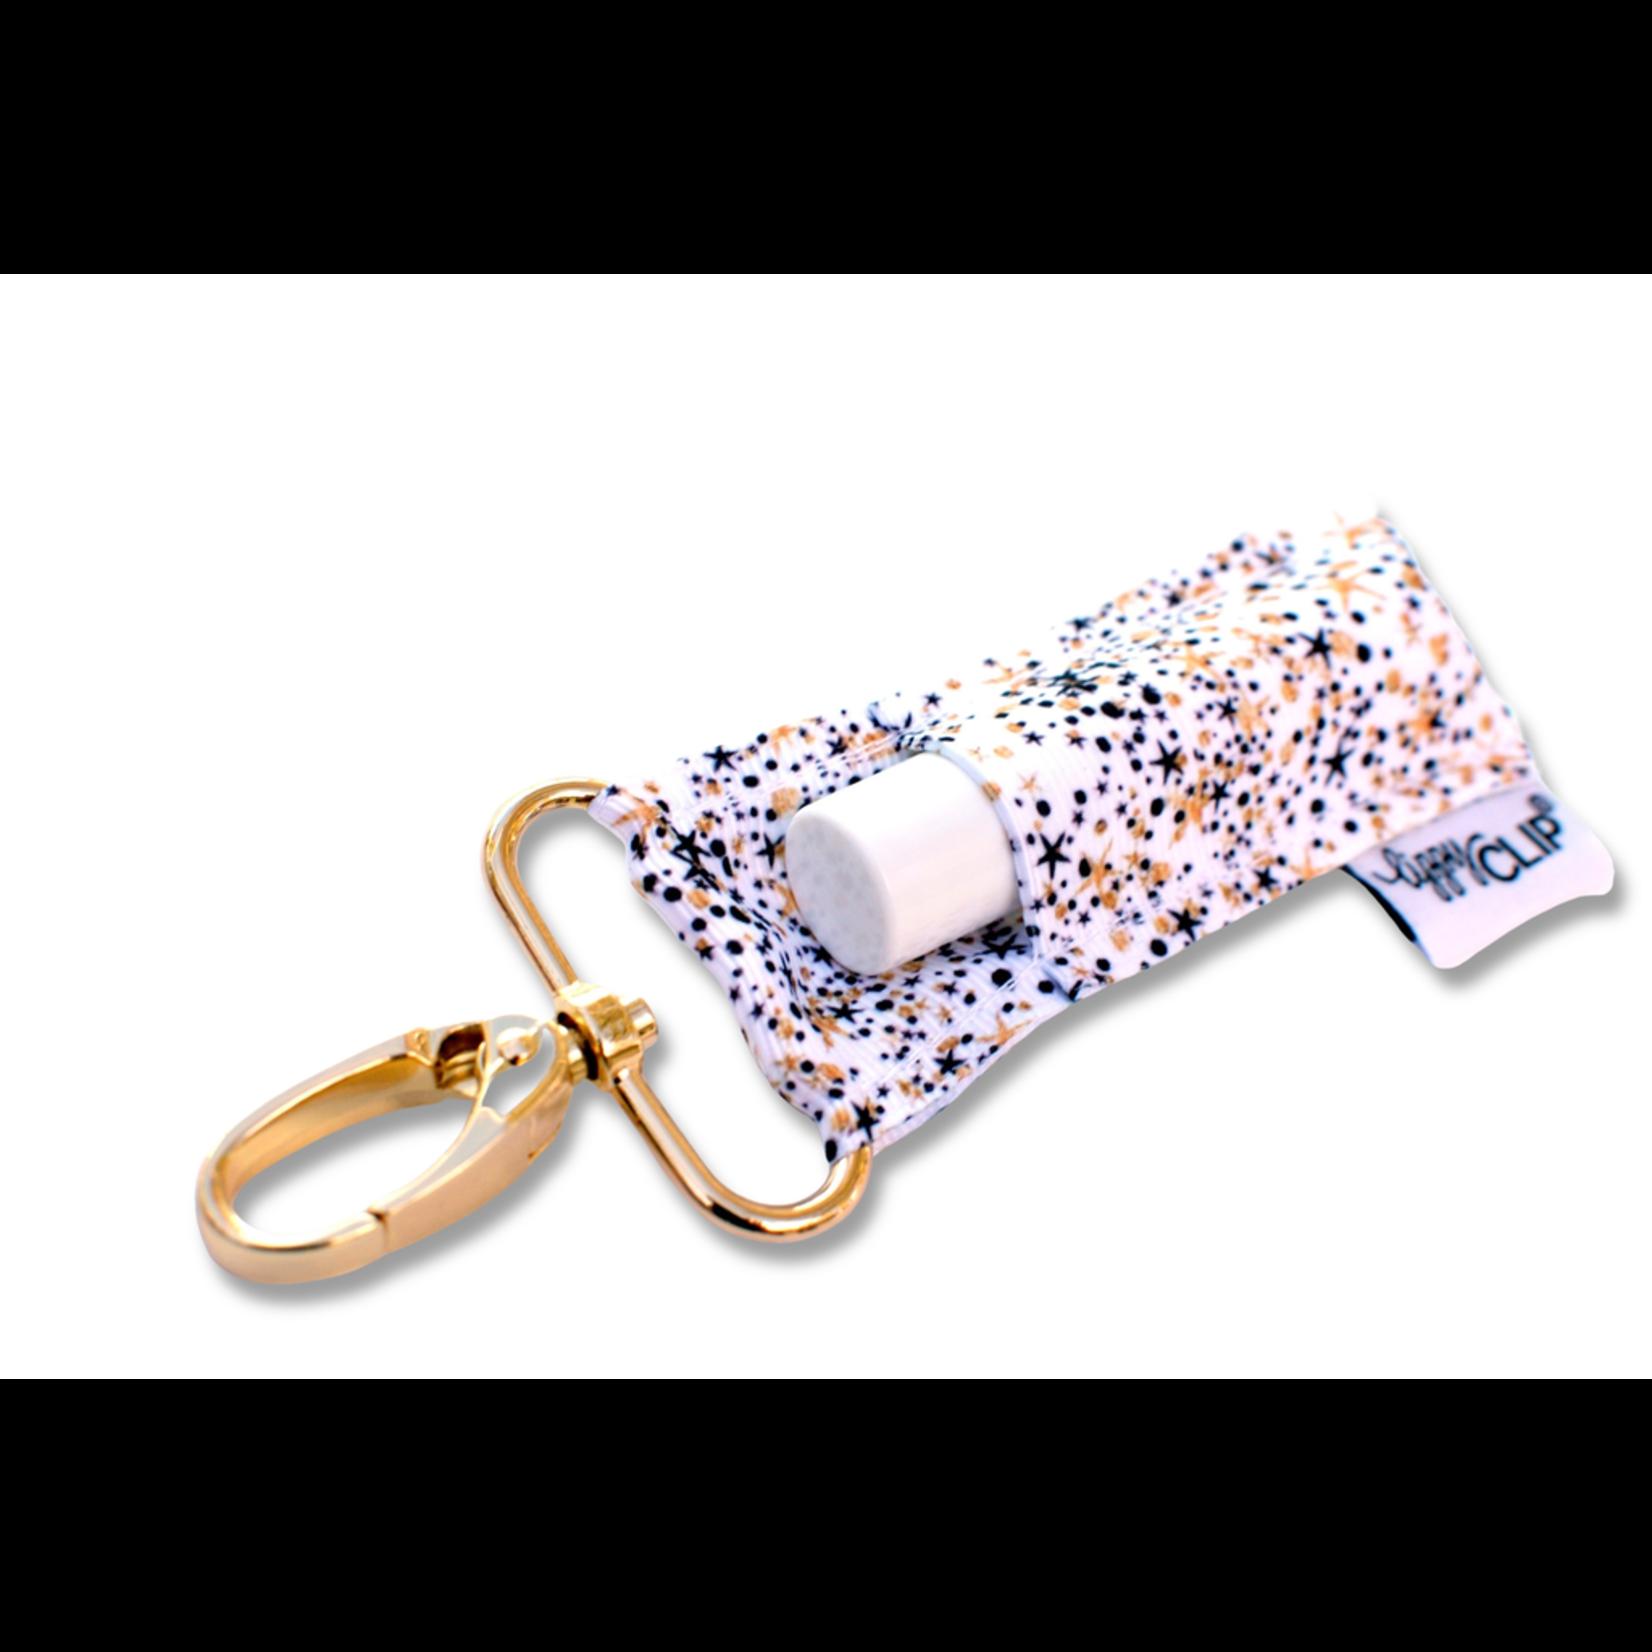 LippyClip BG Confetti lip balm holder